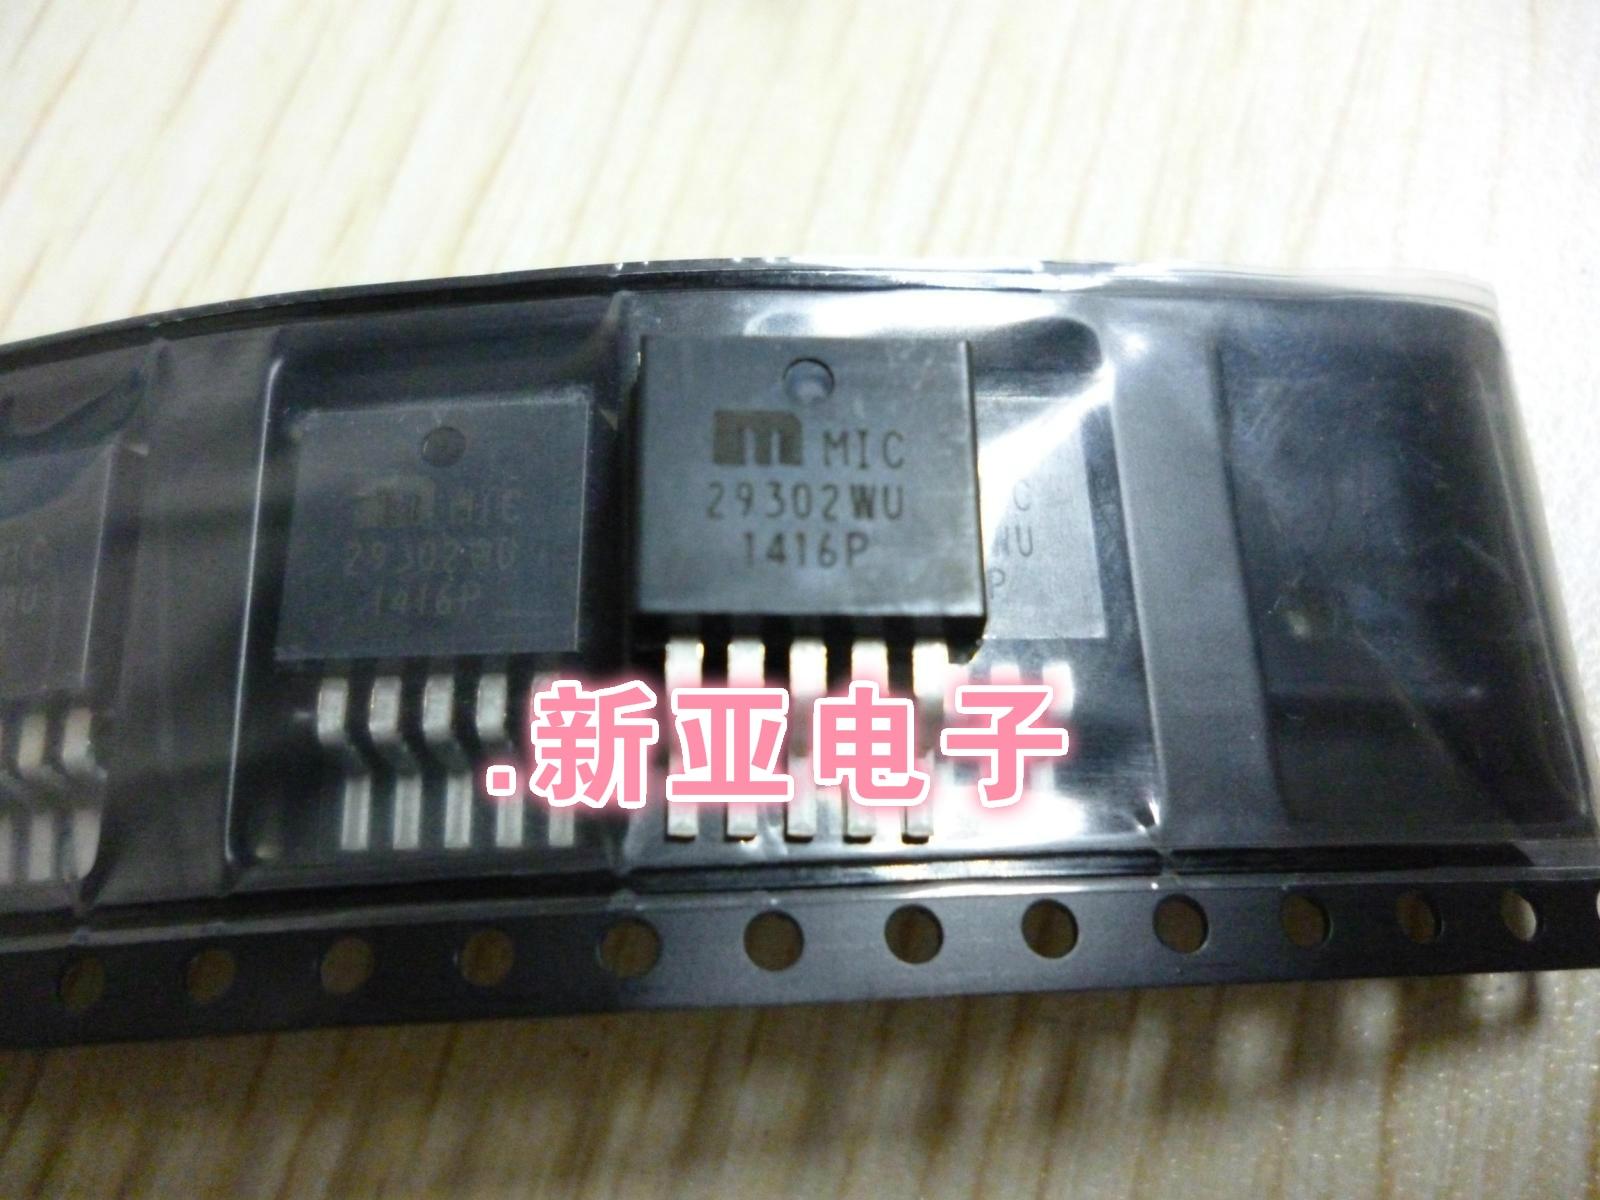 100% Novo & original ICMIC29302WU SOT263-5